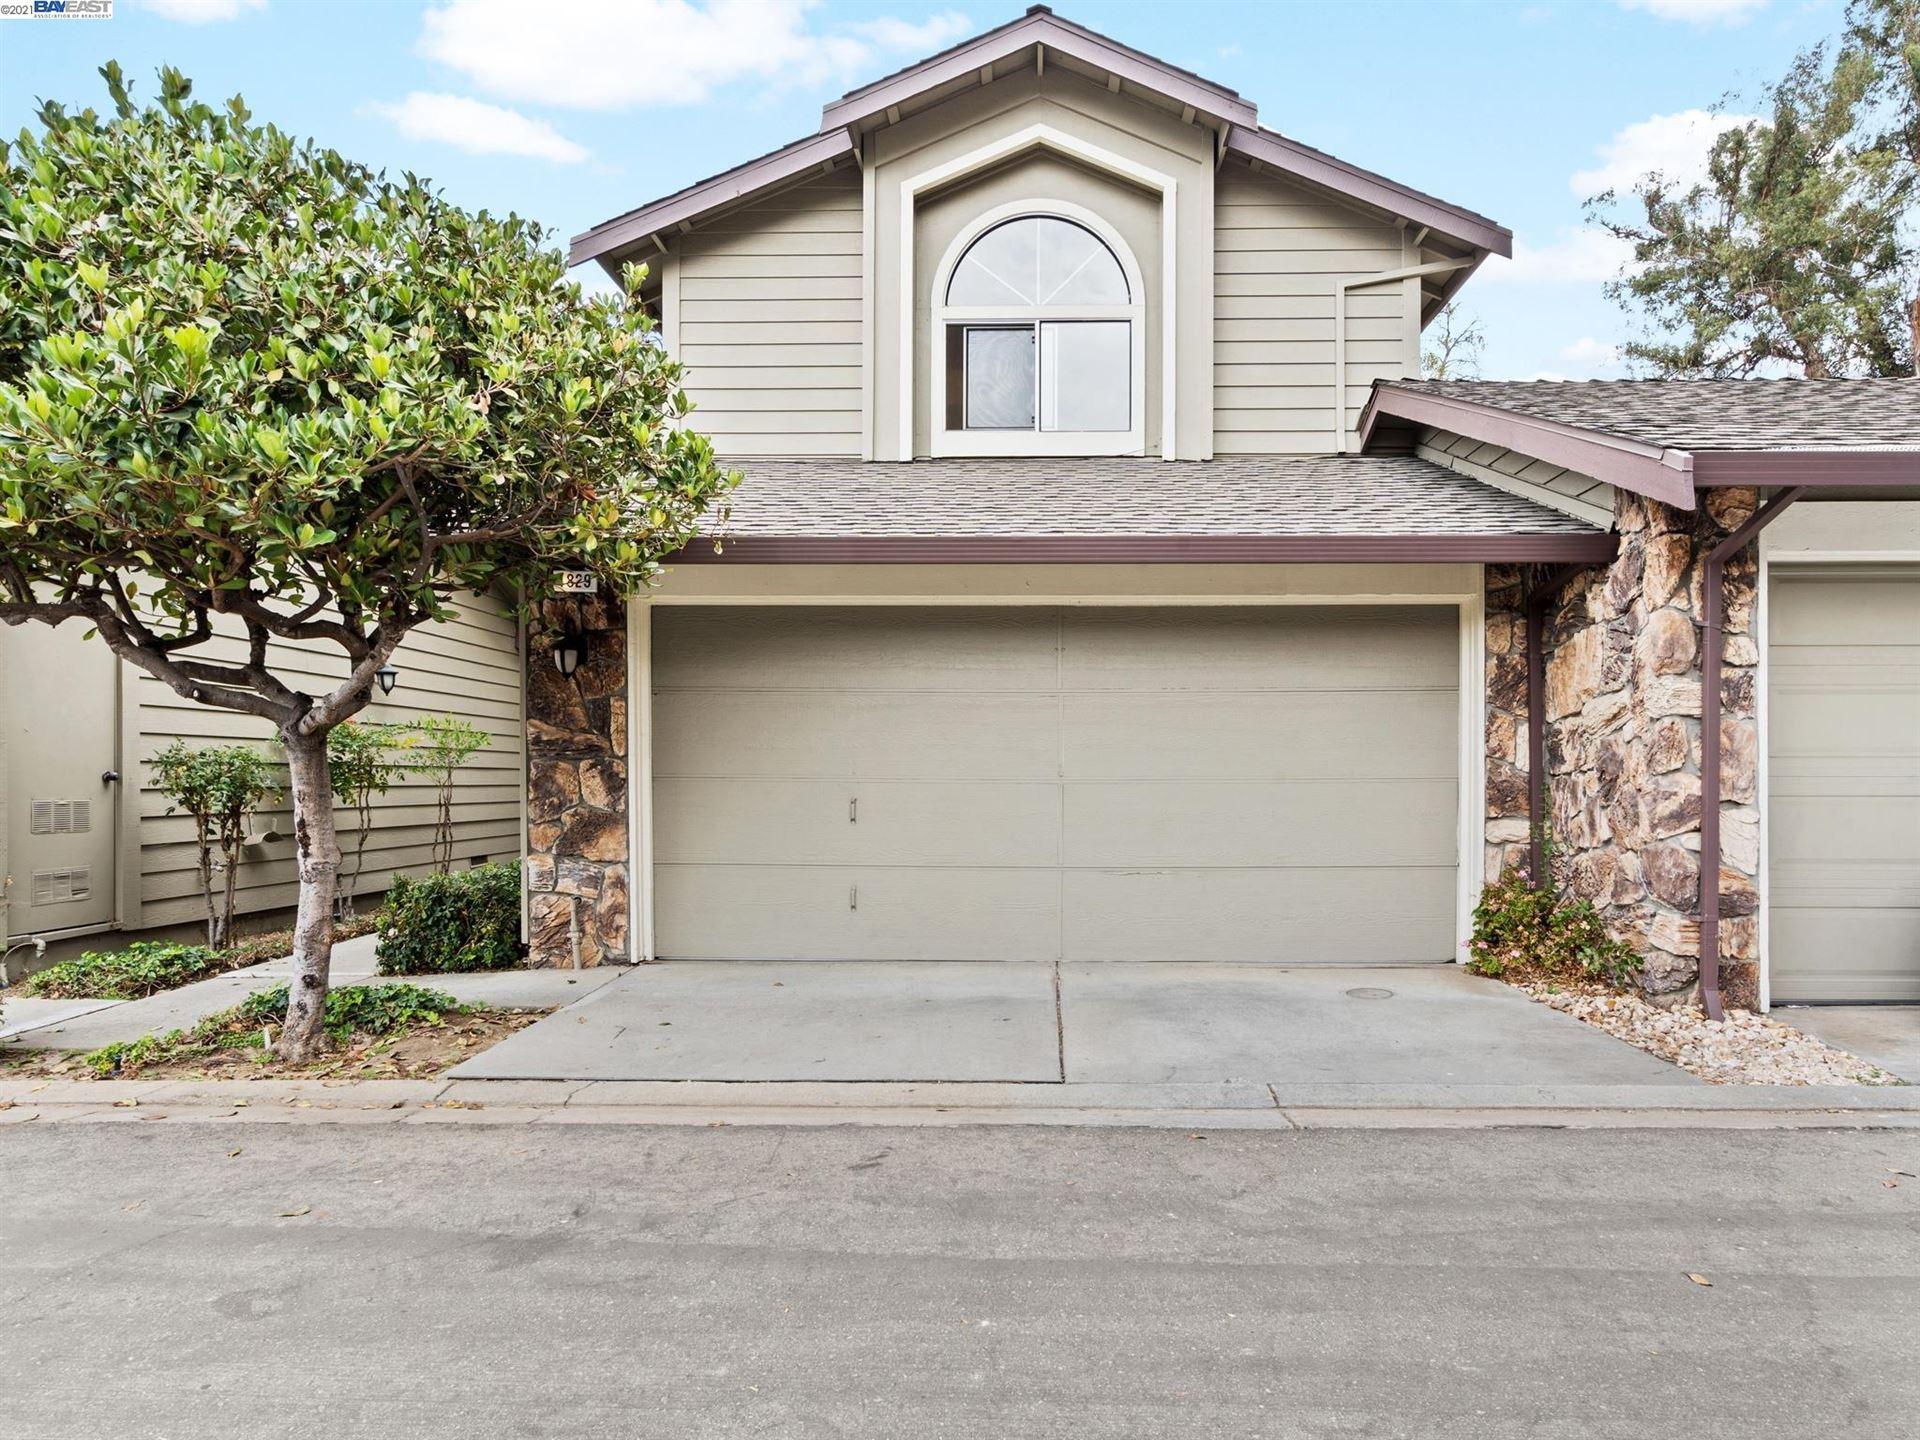 4829 River Trail Ct, San Jose, CA 95136 - MLS#: 40970274